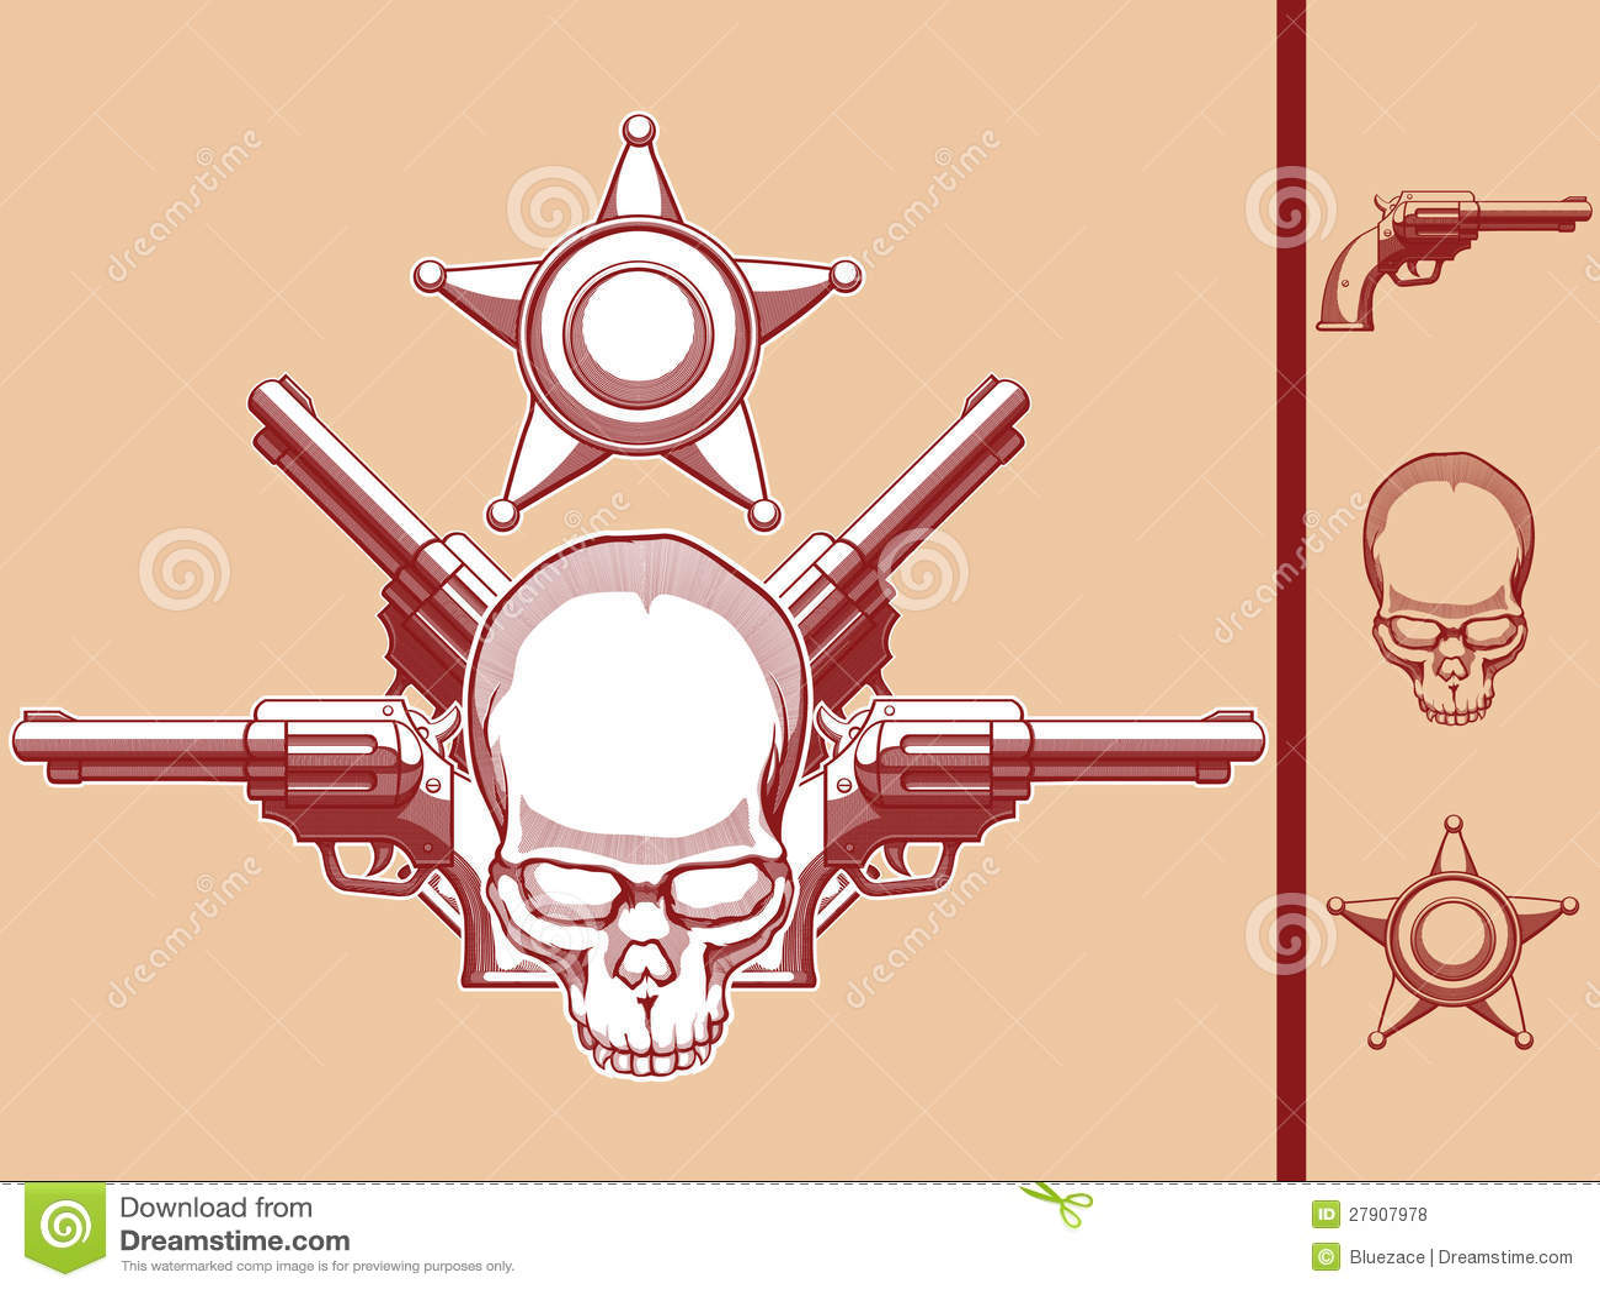 wild-west-skull-revolver-sheriff-badge-2